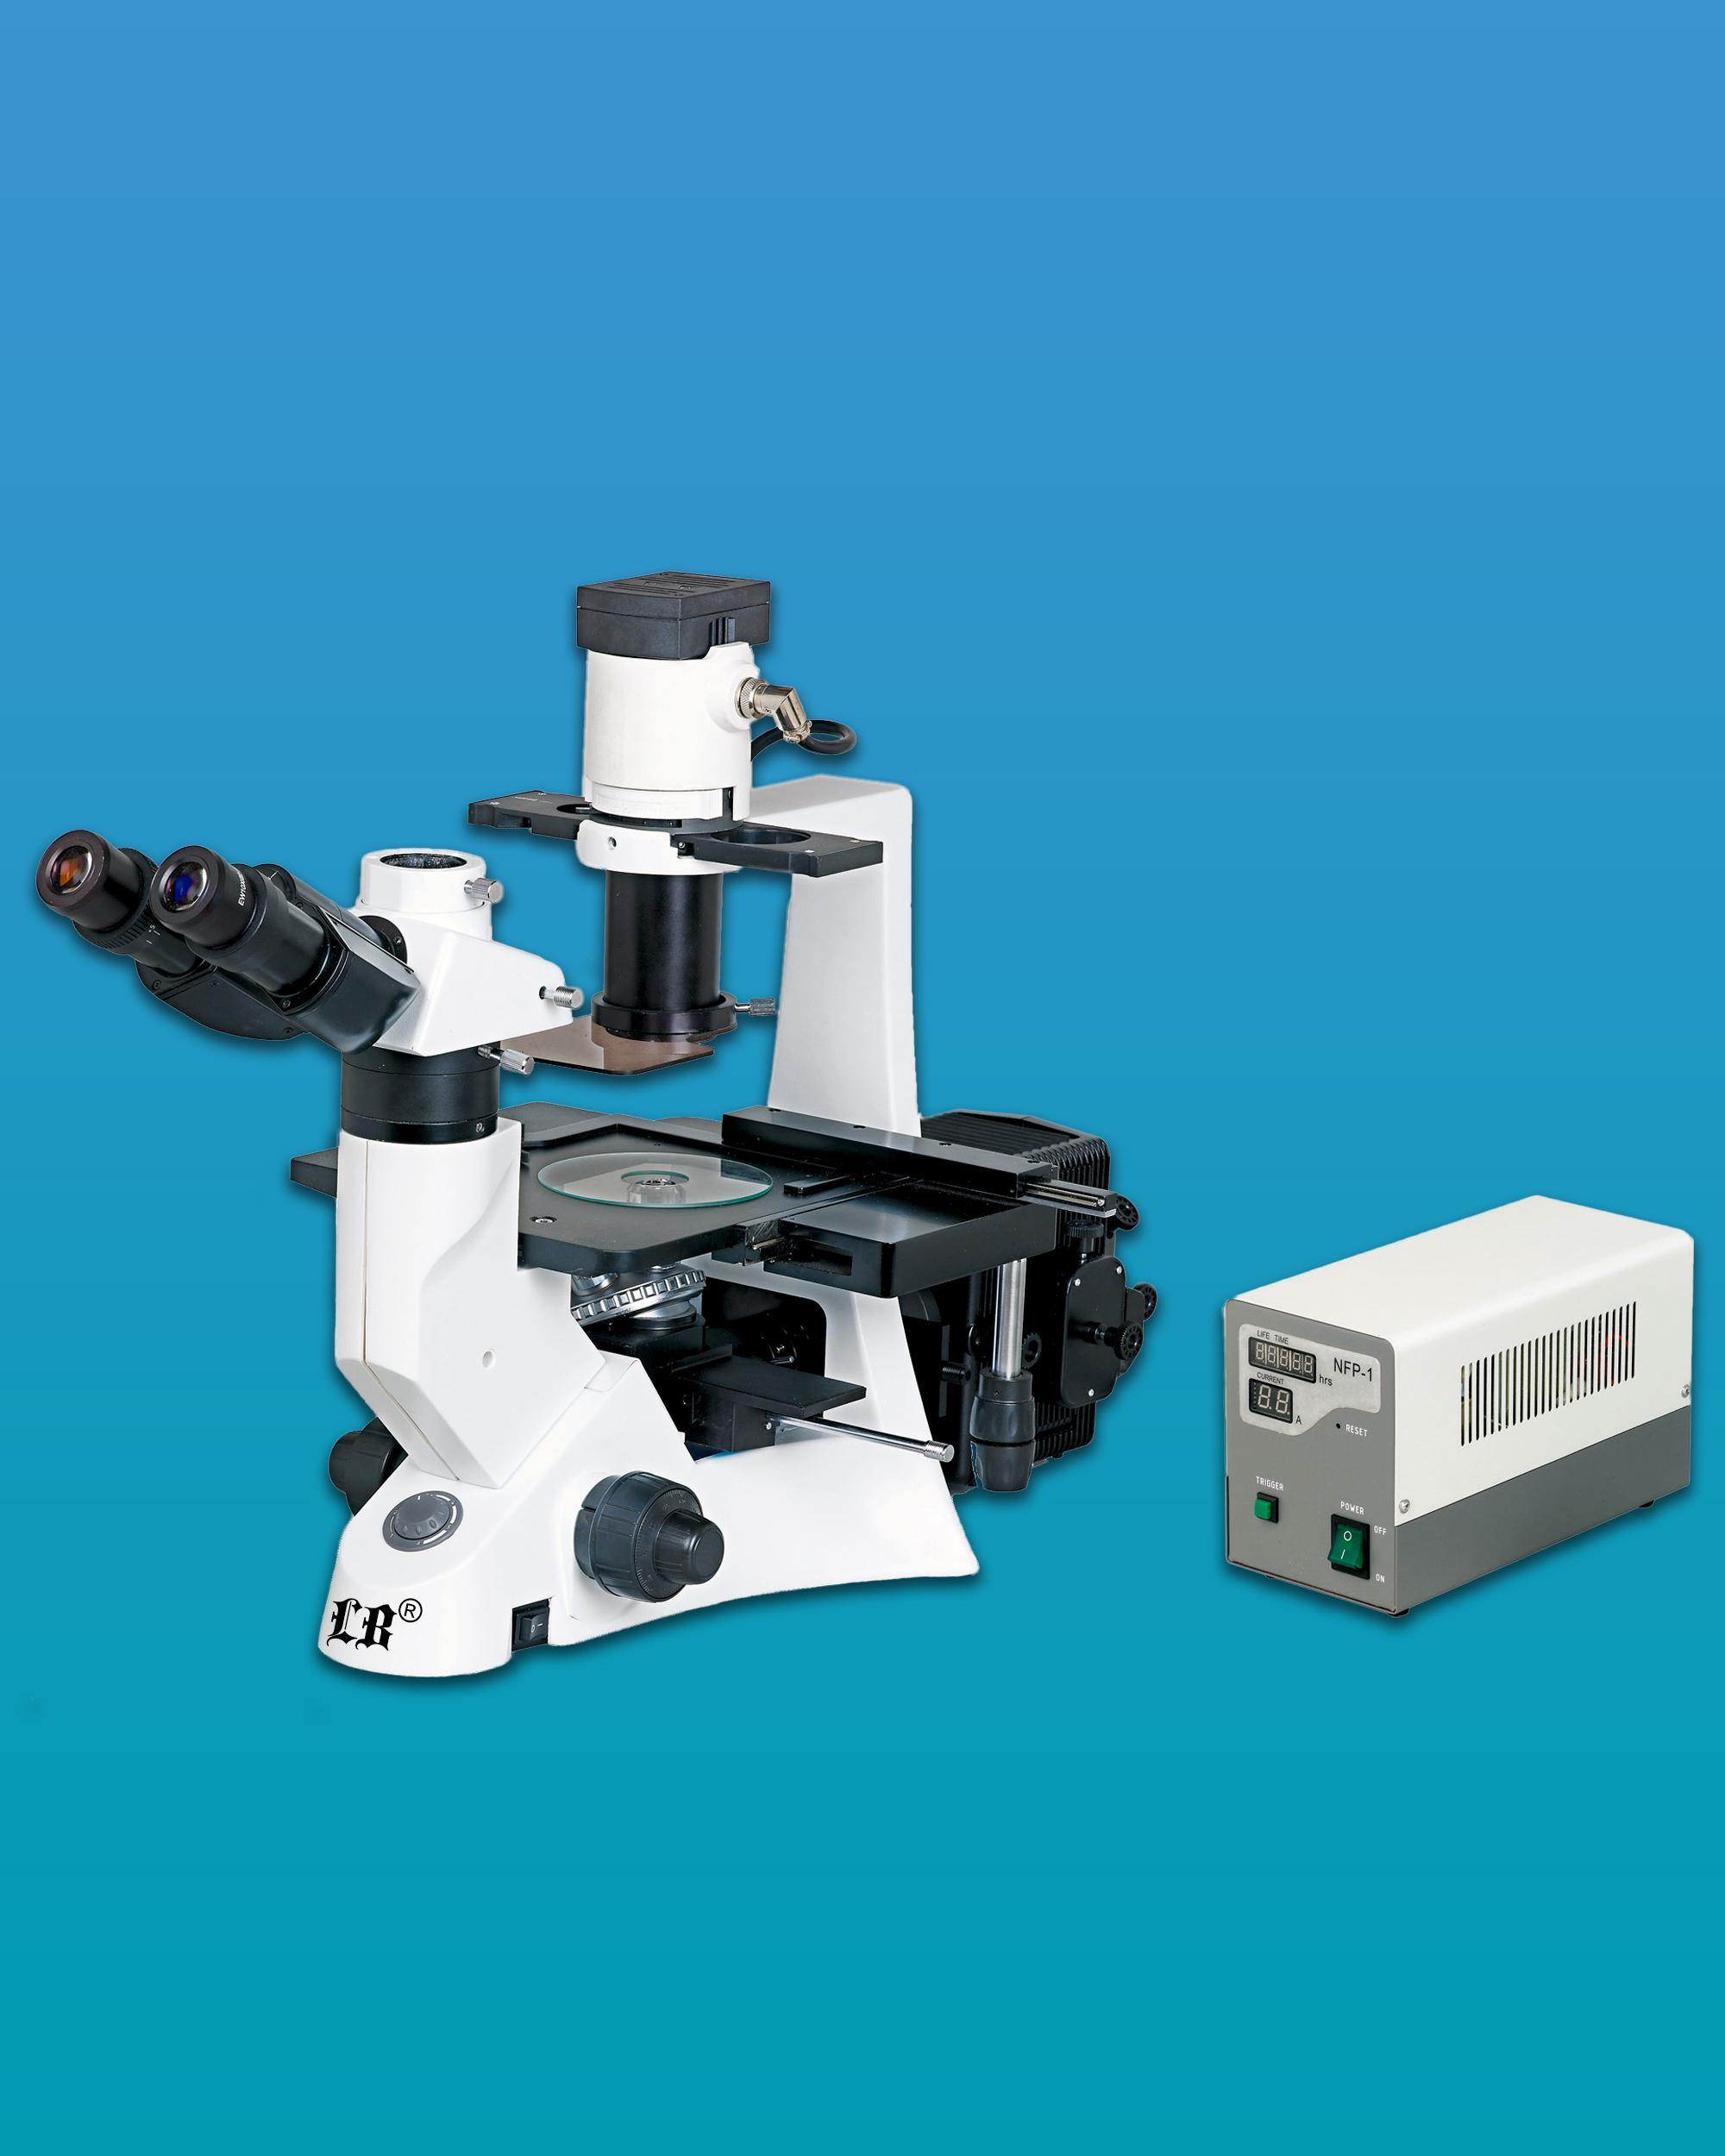 [LB-702] Inverted Trinocular Flourescent Biological Microscope w/ Infinite Optical System